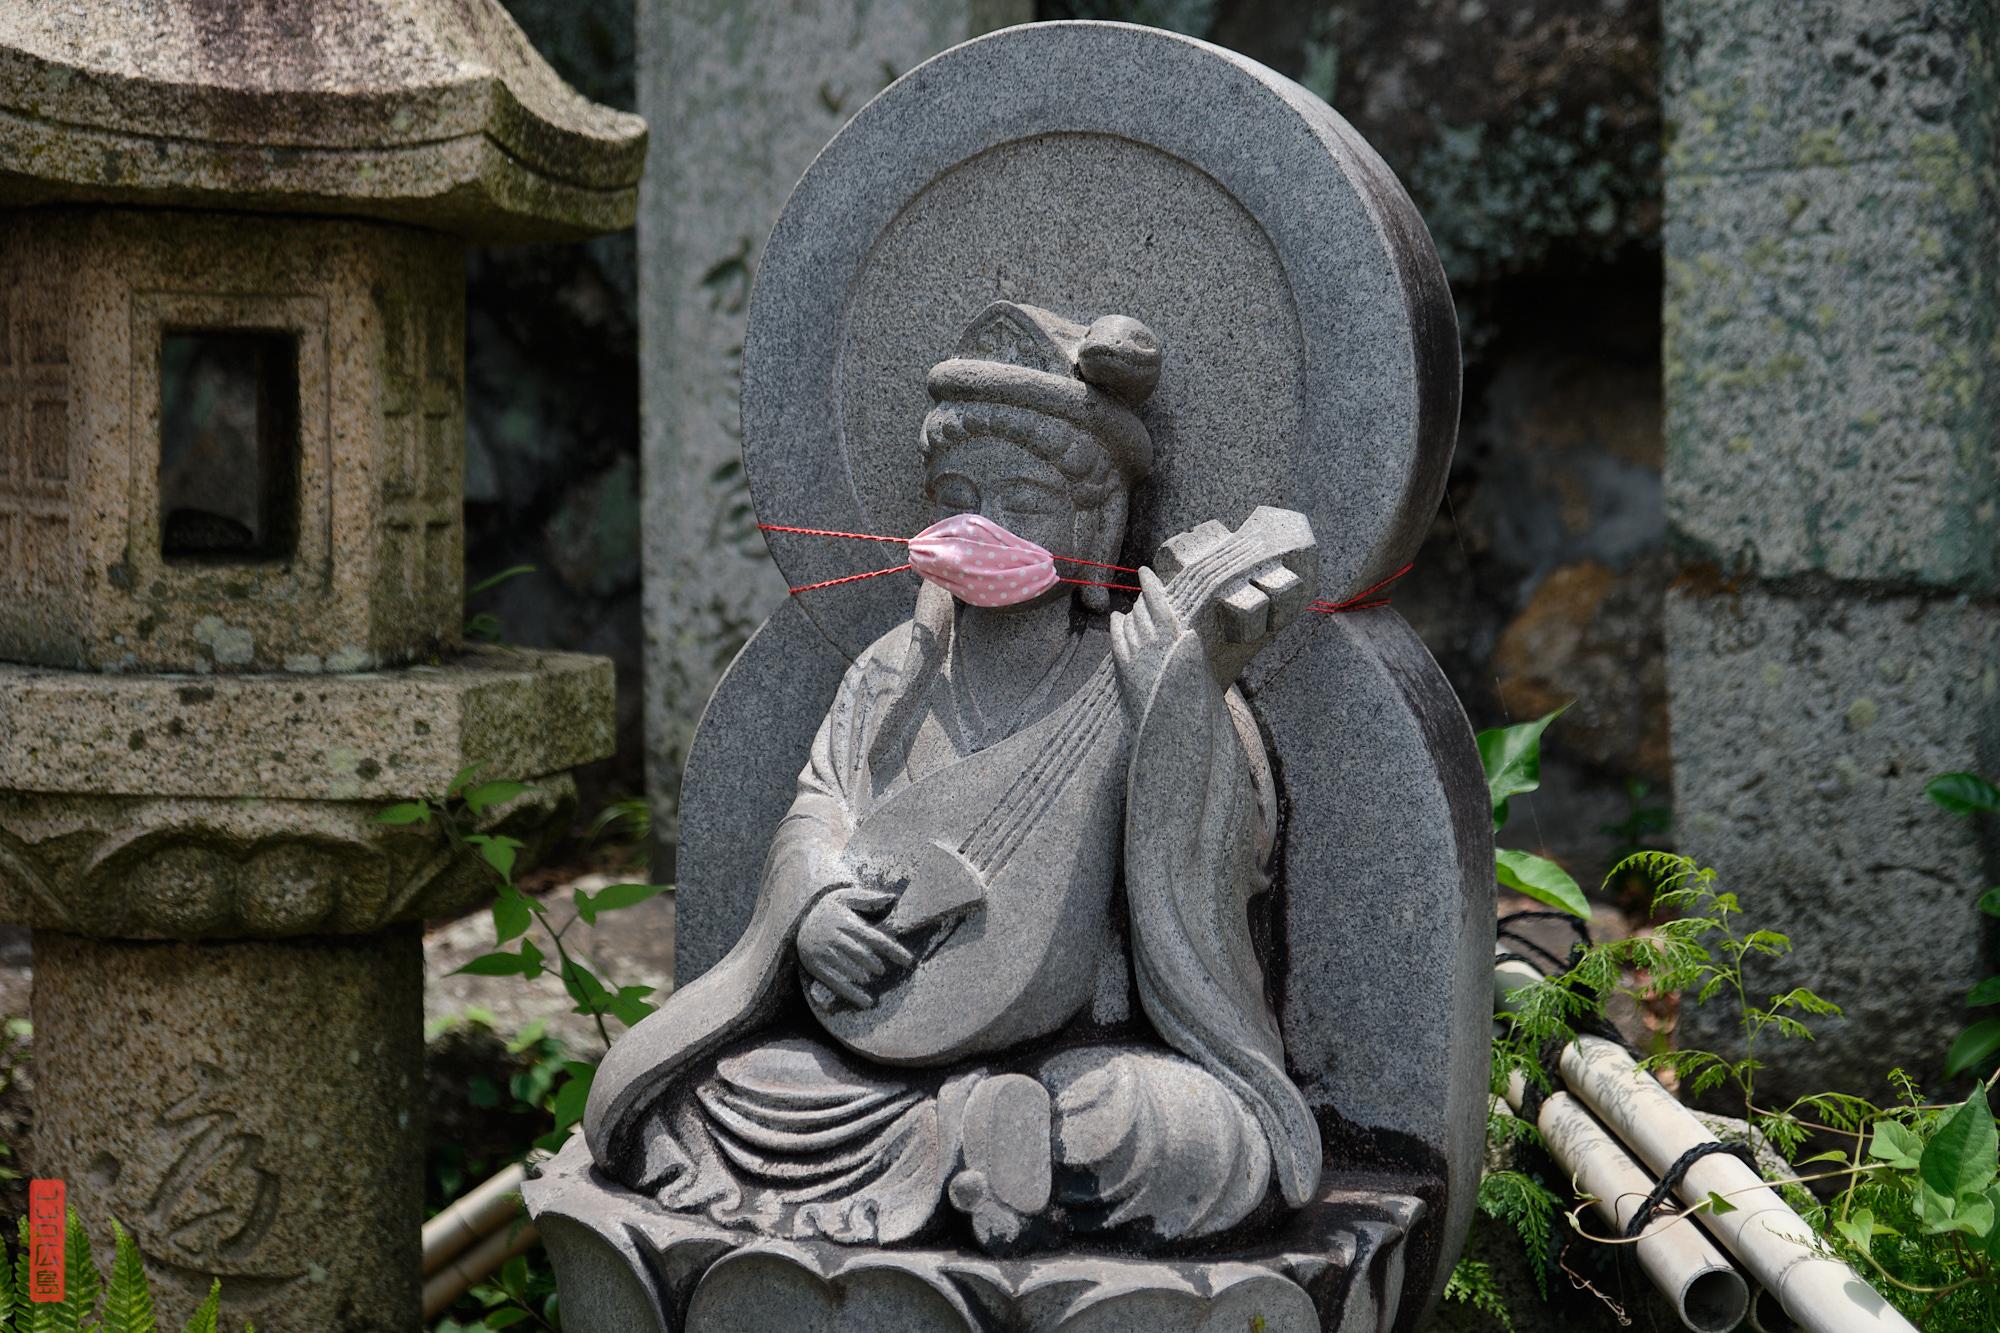 stqtuette bouddhique masquée